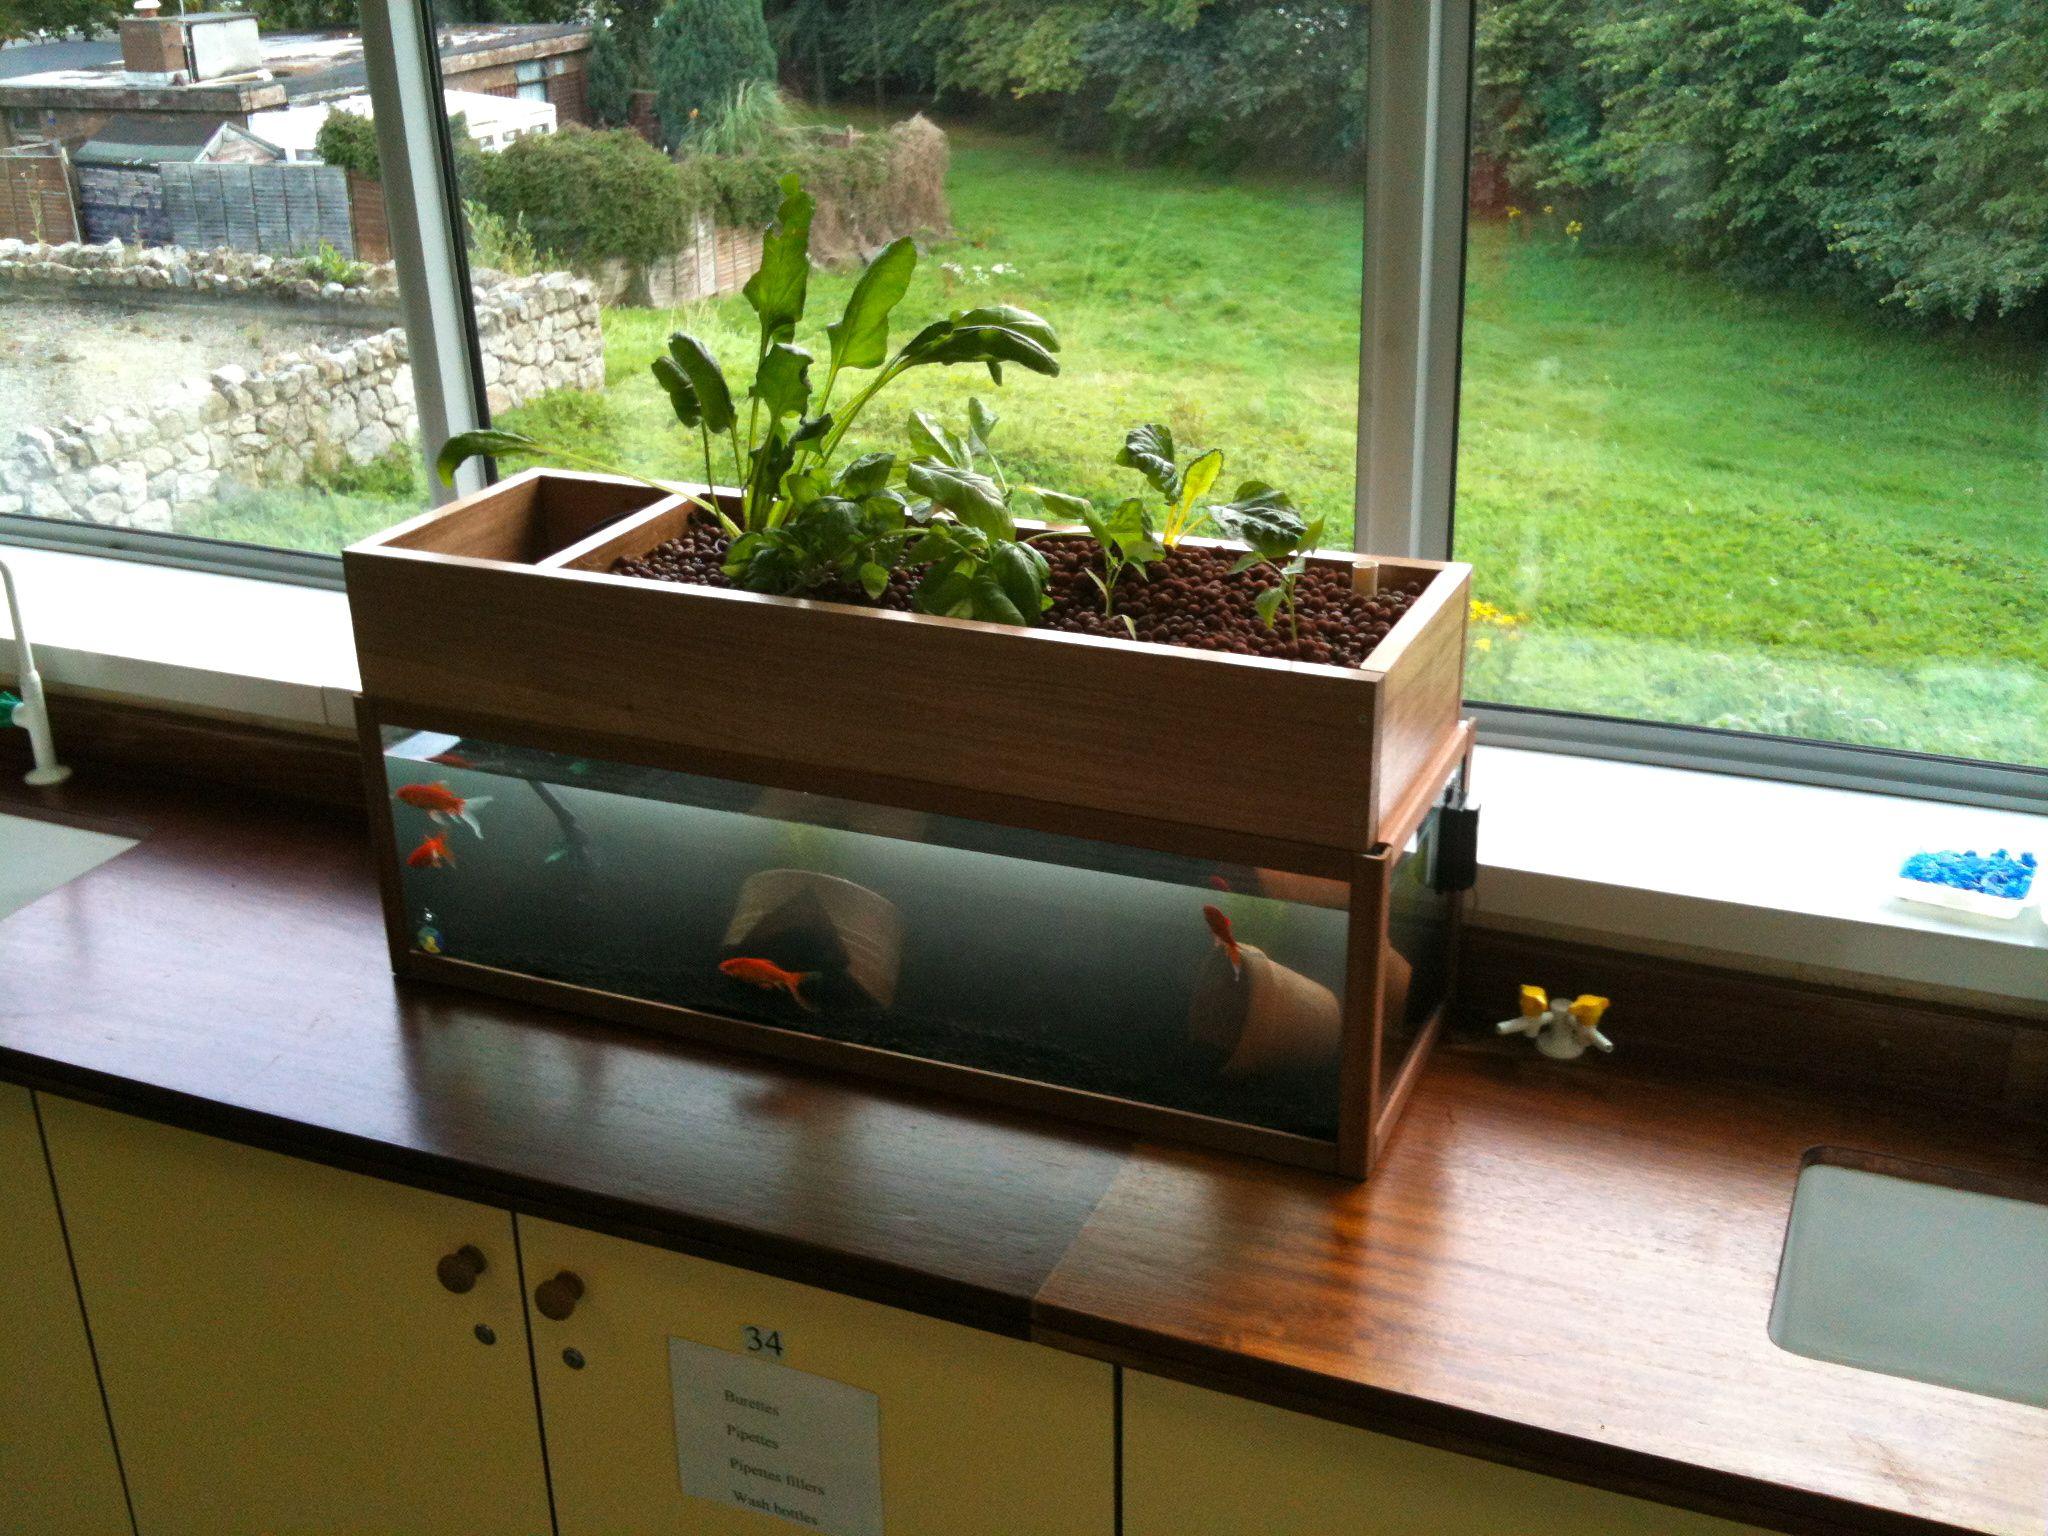 Aquaponics aquaponics system fish tanks and aquariums for Hydroponic fish tank diy